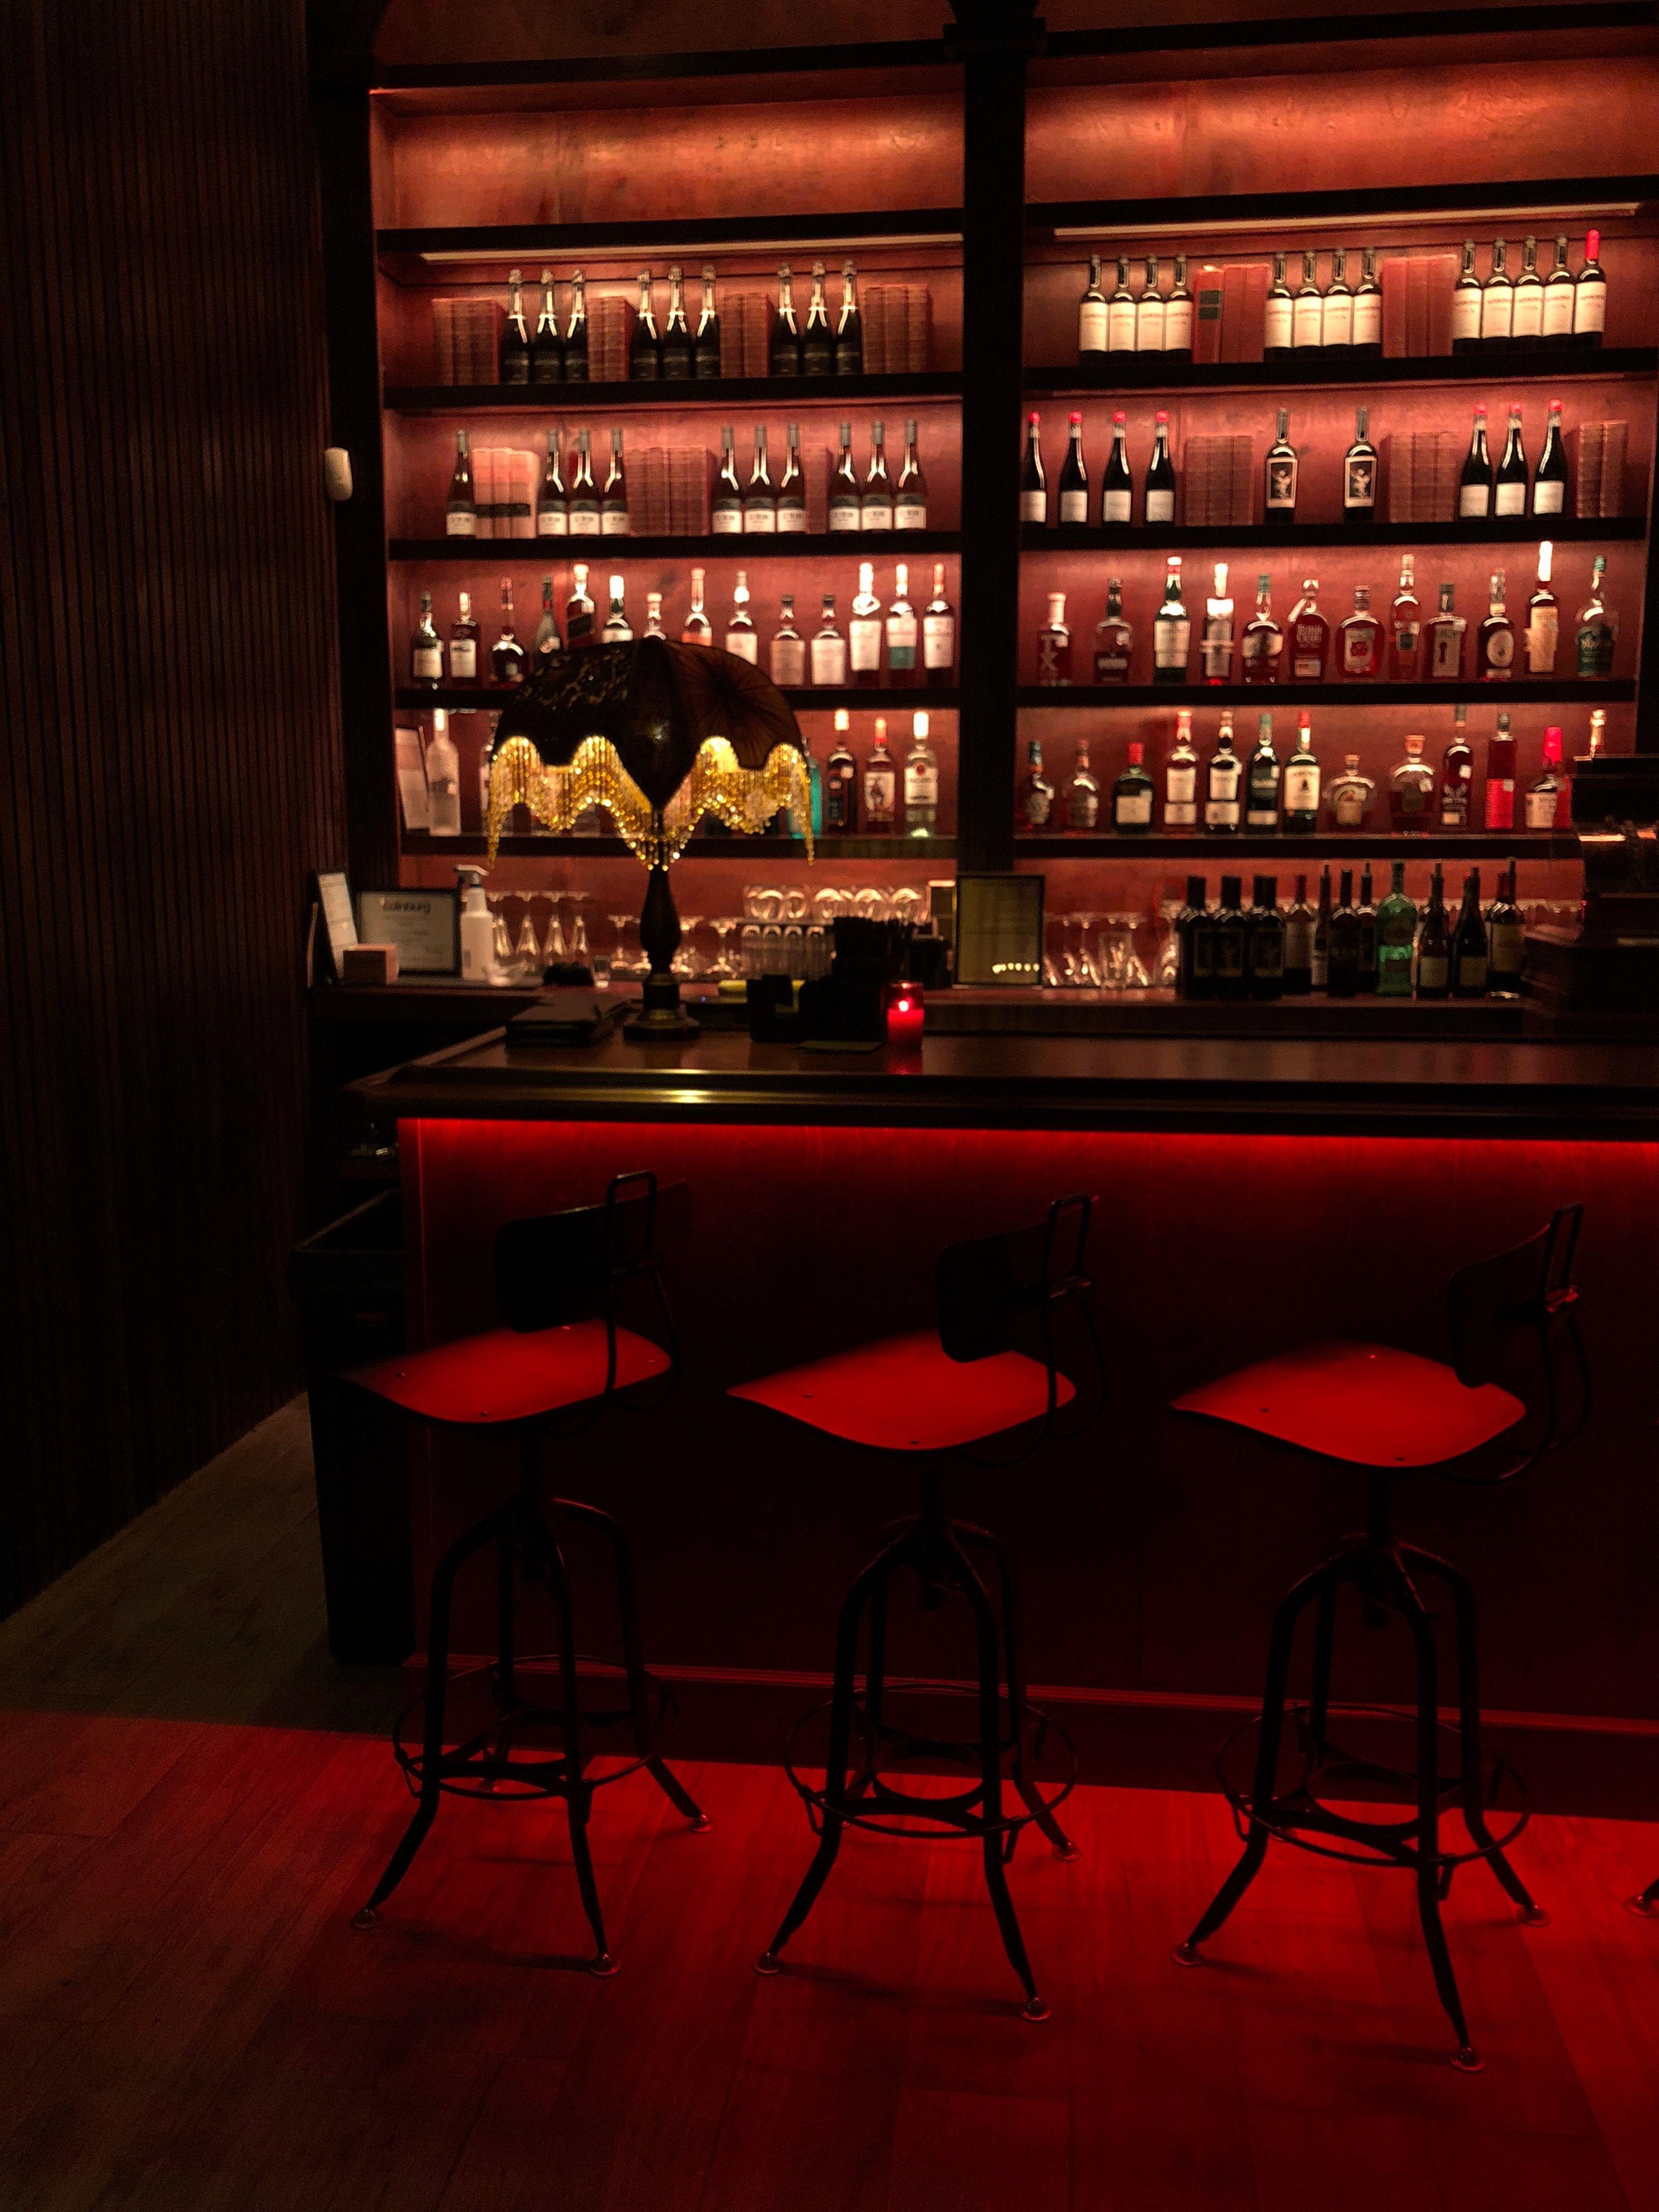 Bar Sidebar215 Speakeasy Red Room Chefs Table Sidebar Speakeasy Grand Hall Design Architecture Bar Interior Speakeasy Bar Speakeasy